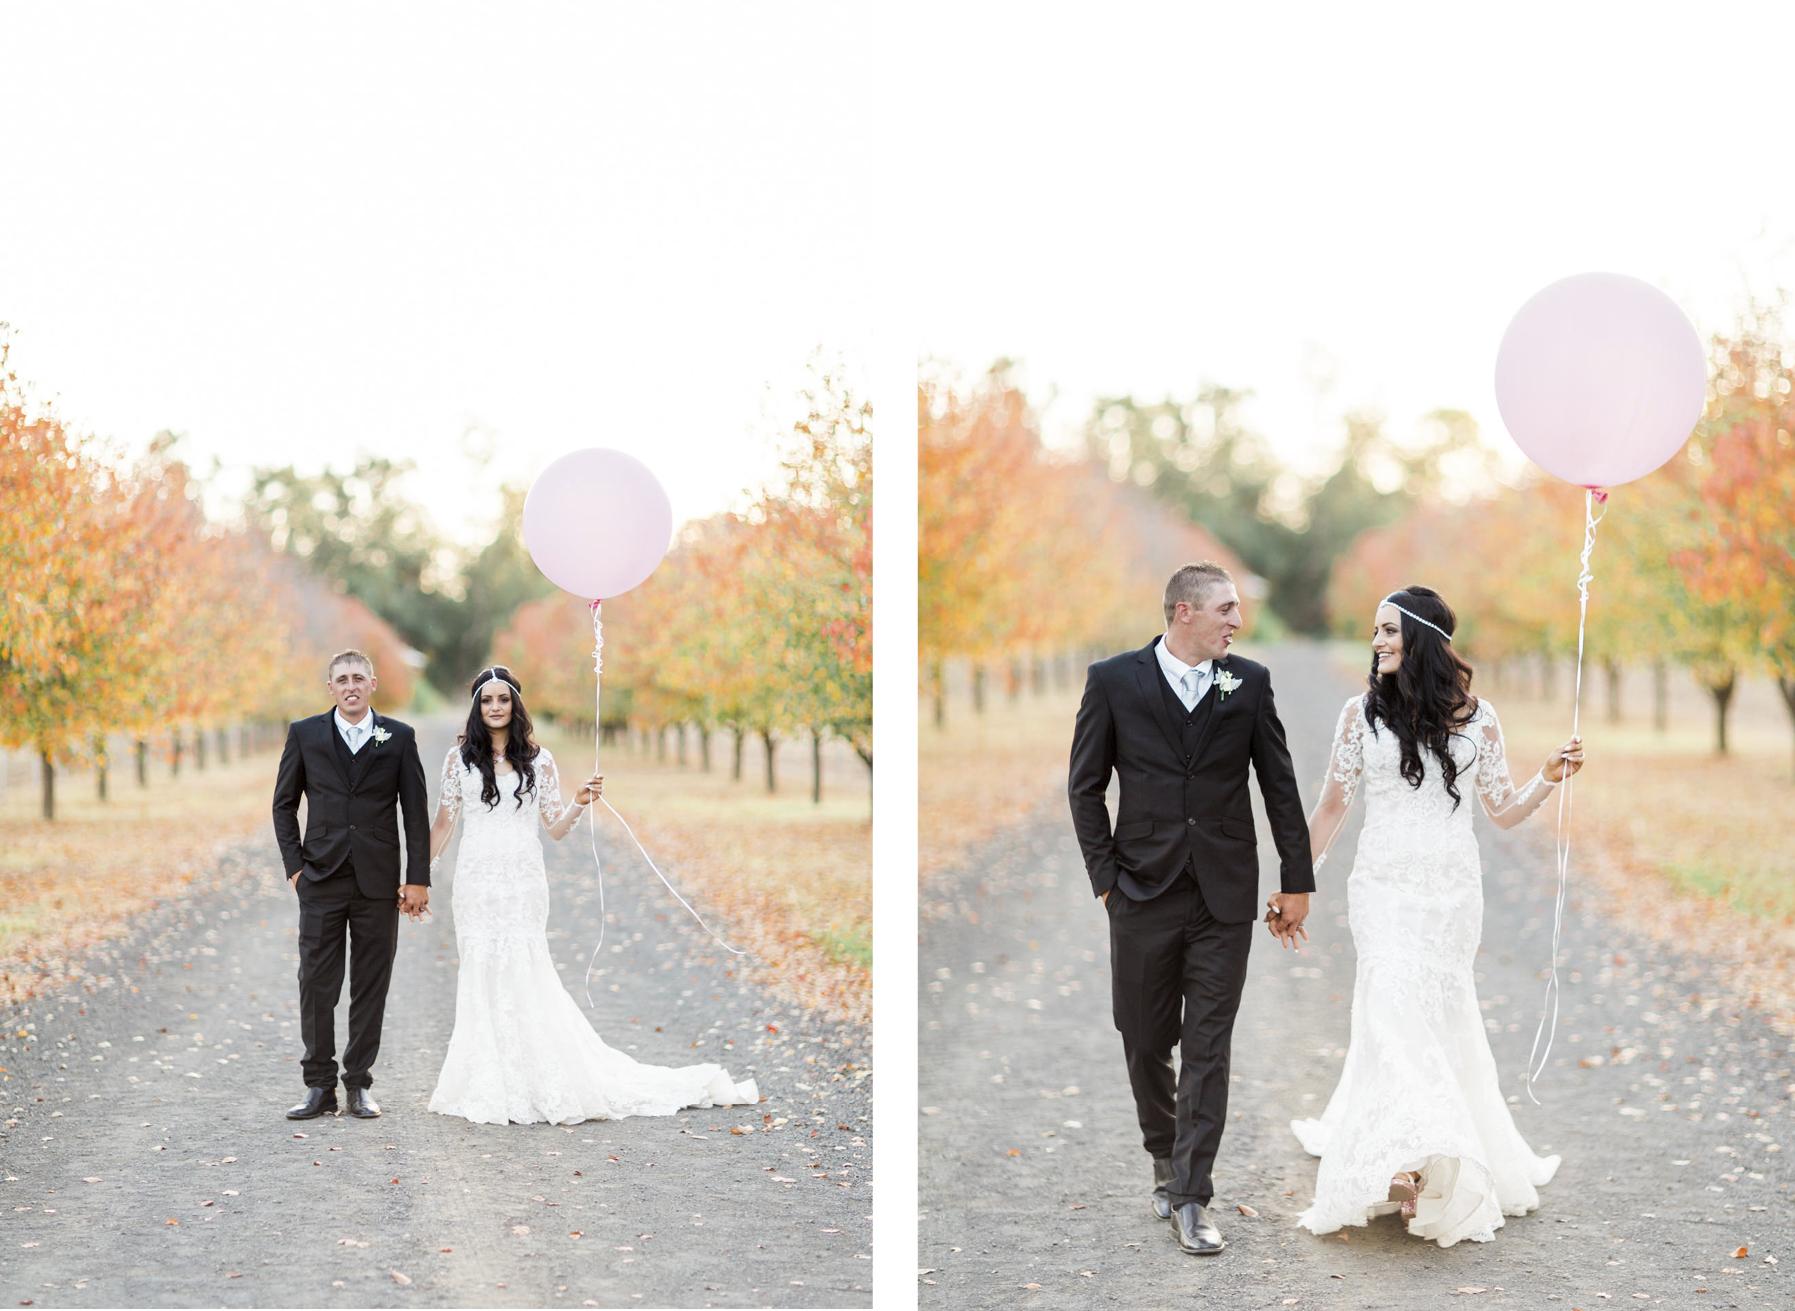 WeddingPhotos_Facebook_2046pixels-1516joined.jpg